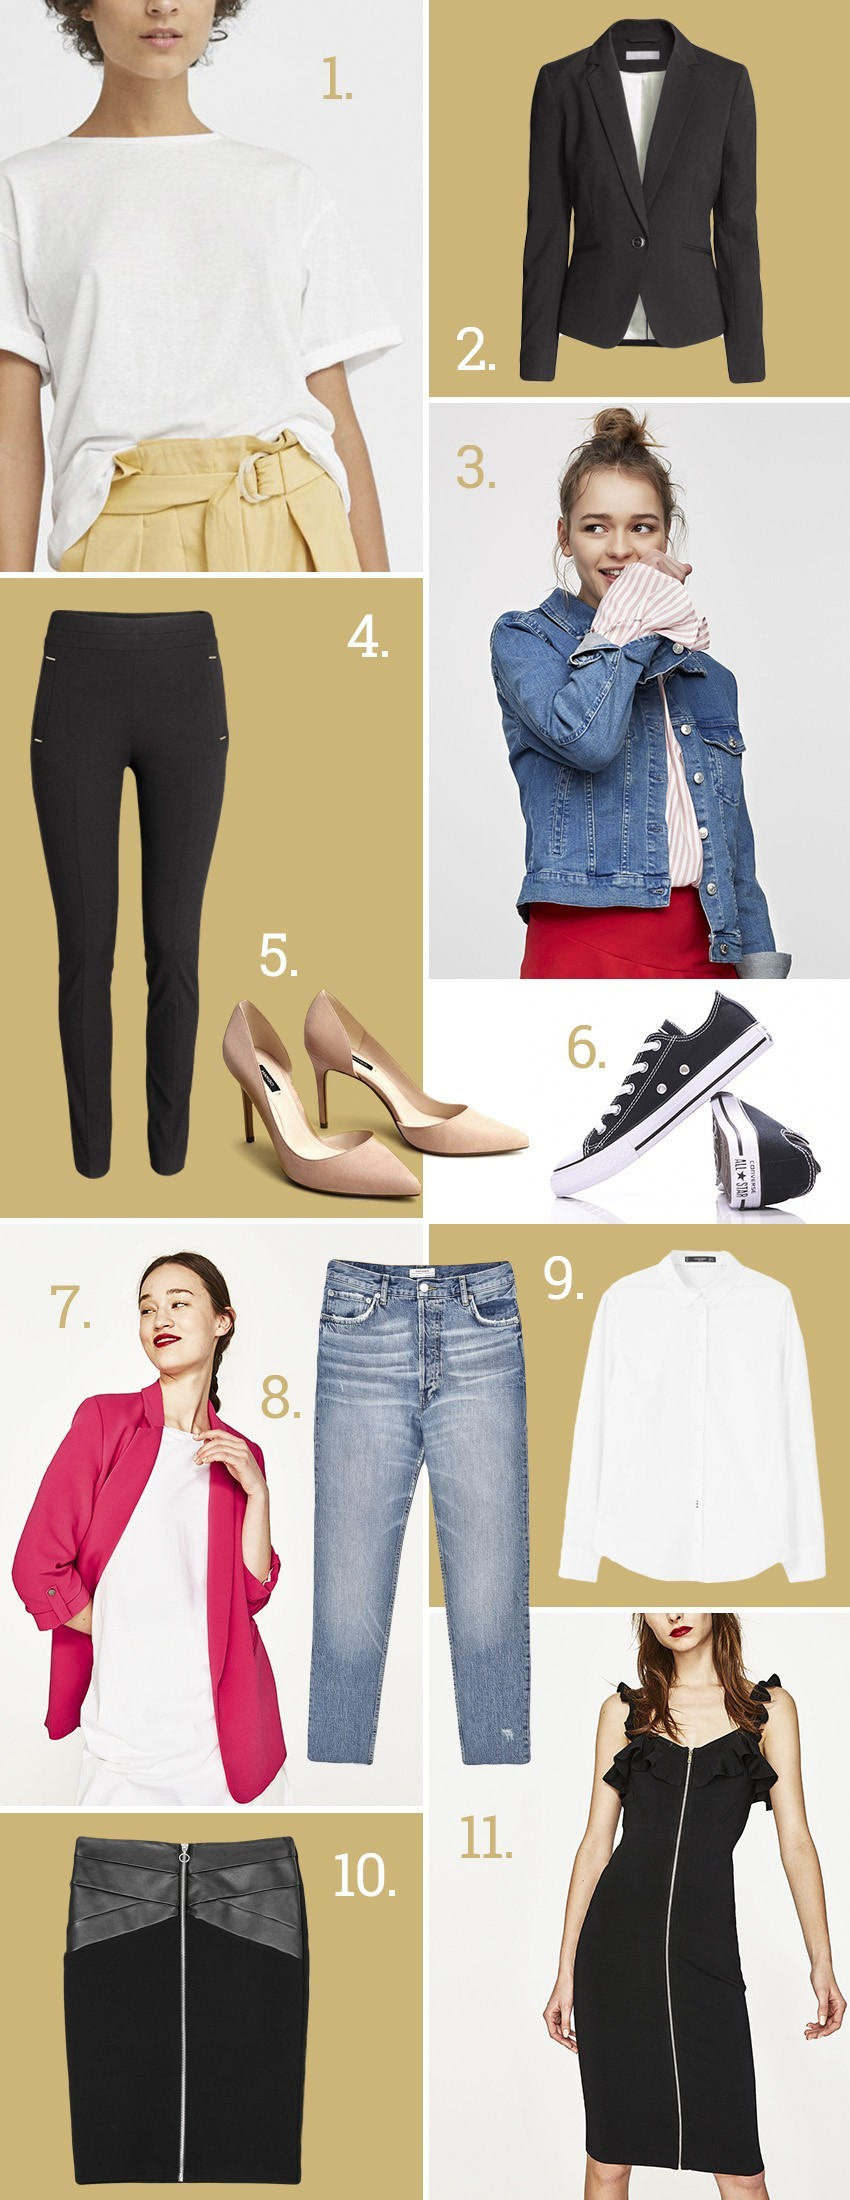 1.Mango  2.H&M  3.Pull&Bear  4.H&M  5.Mango  6.Converse  7.Zara  8.Zara  9.Mango  10.Stradivarius  11.Zara